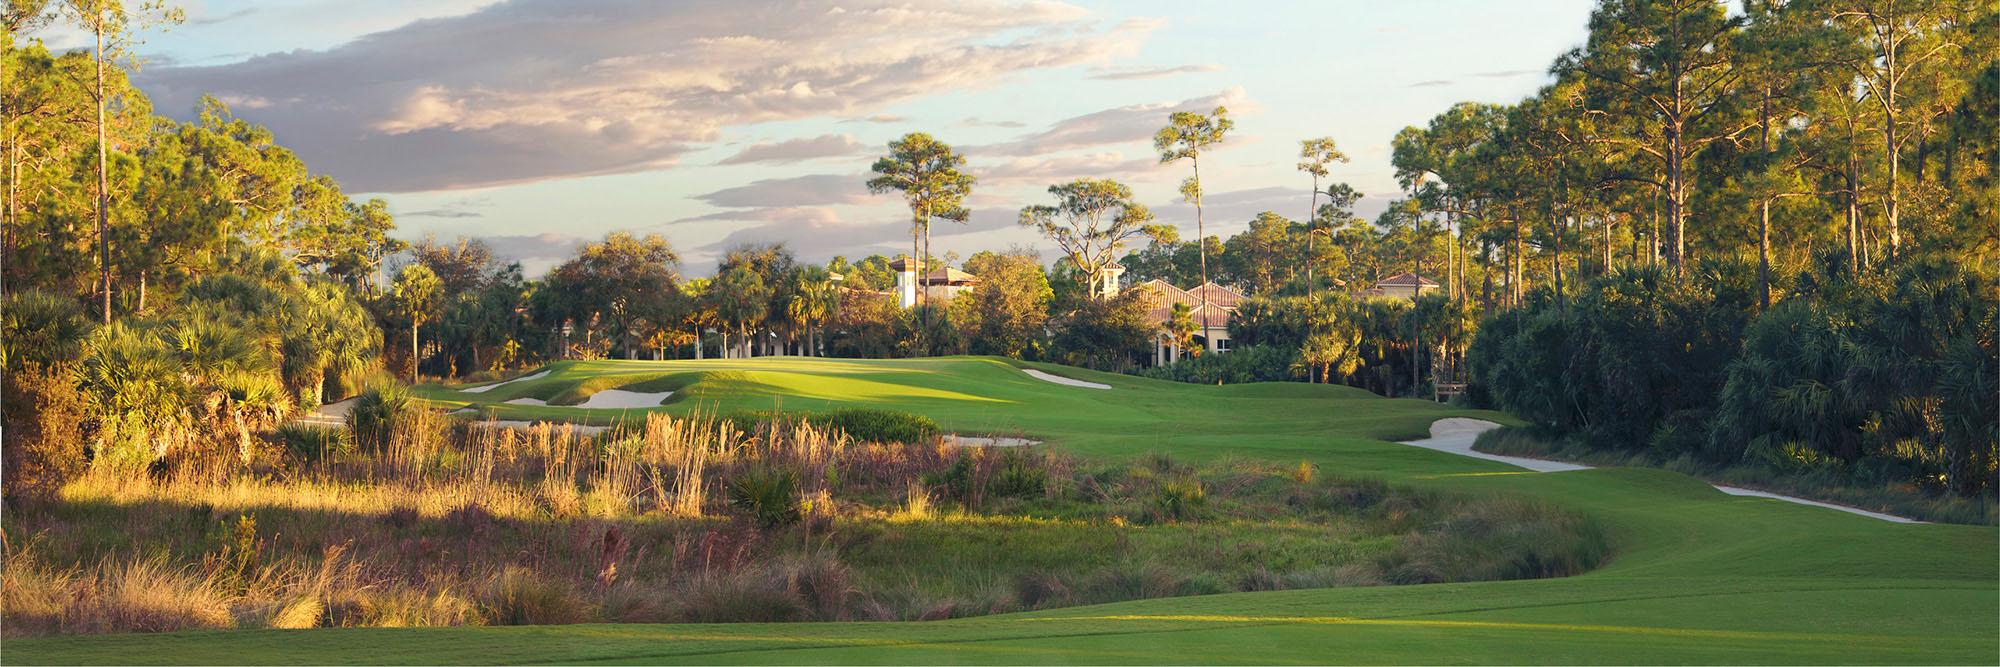 Golf Course Image - Mirasol Sunrise No. 15